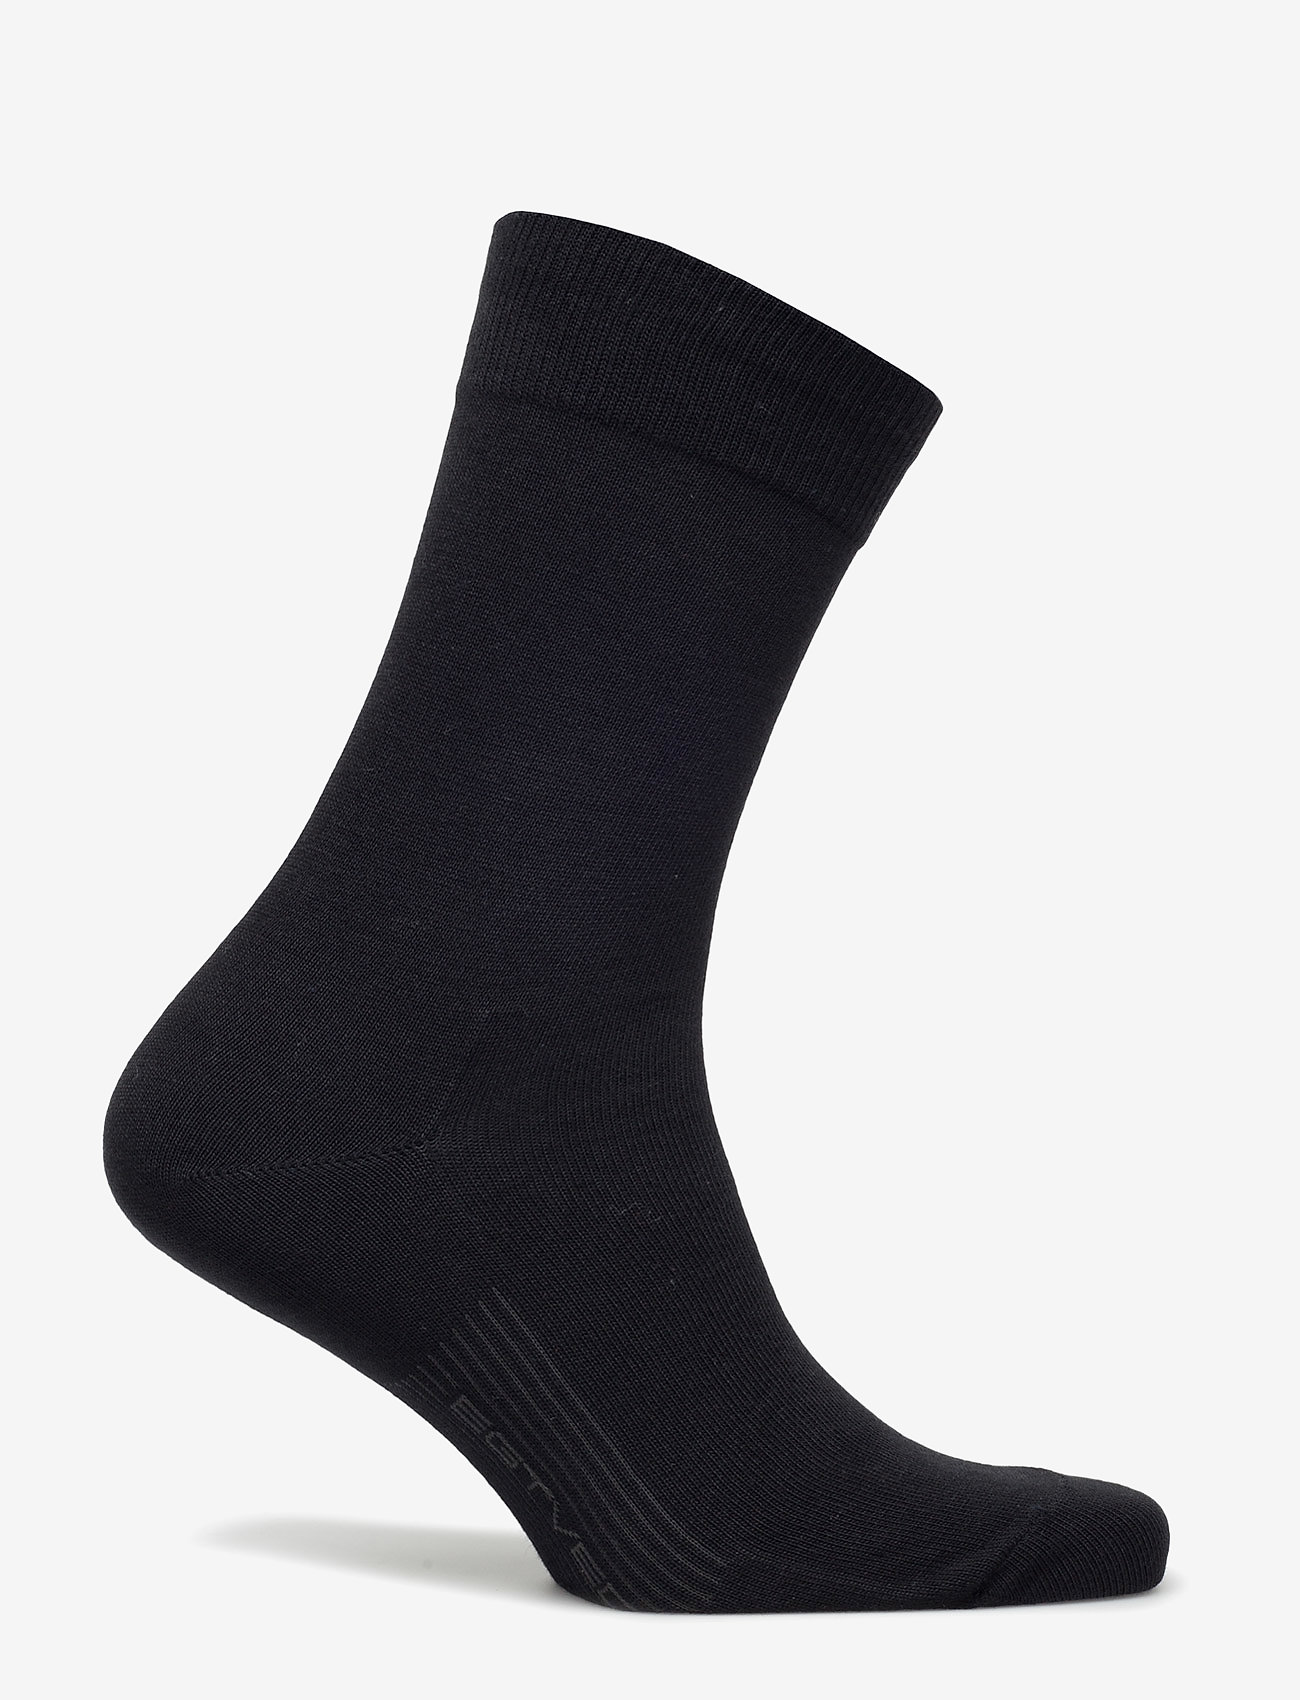 Egtved - Egtved business socks - reguläre strümpfe - black - 1